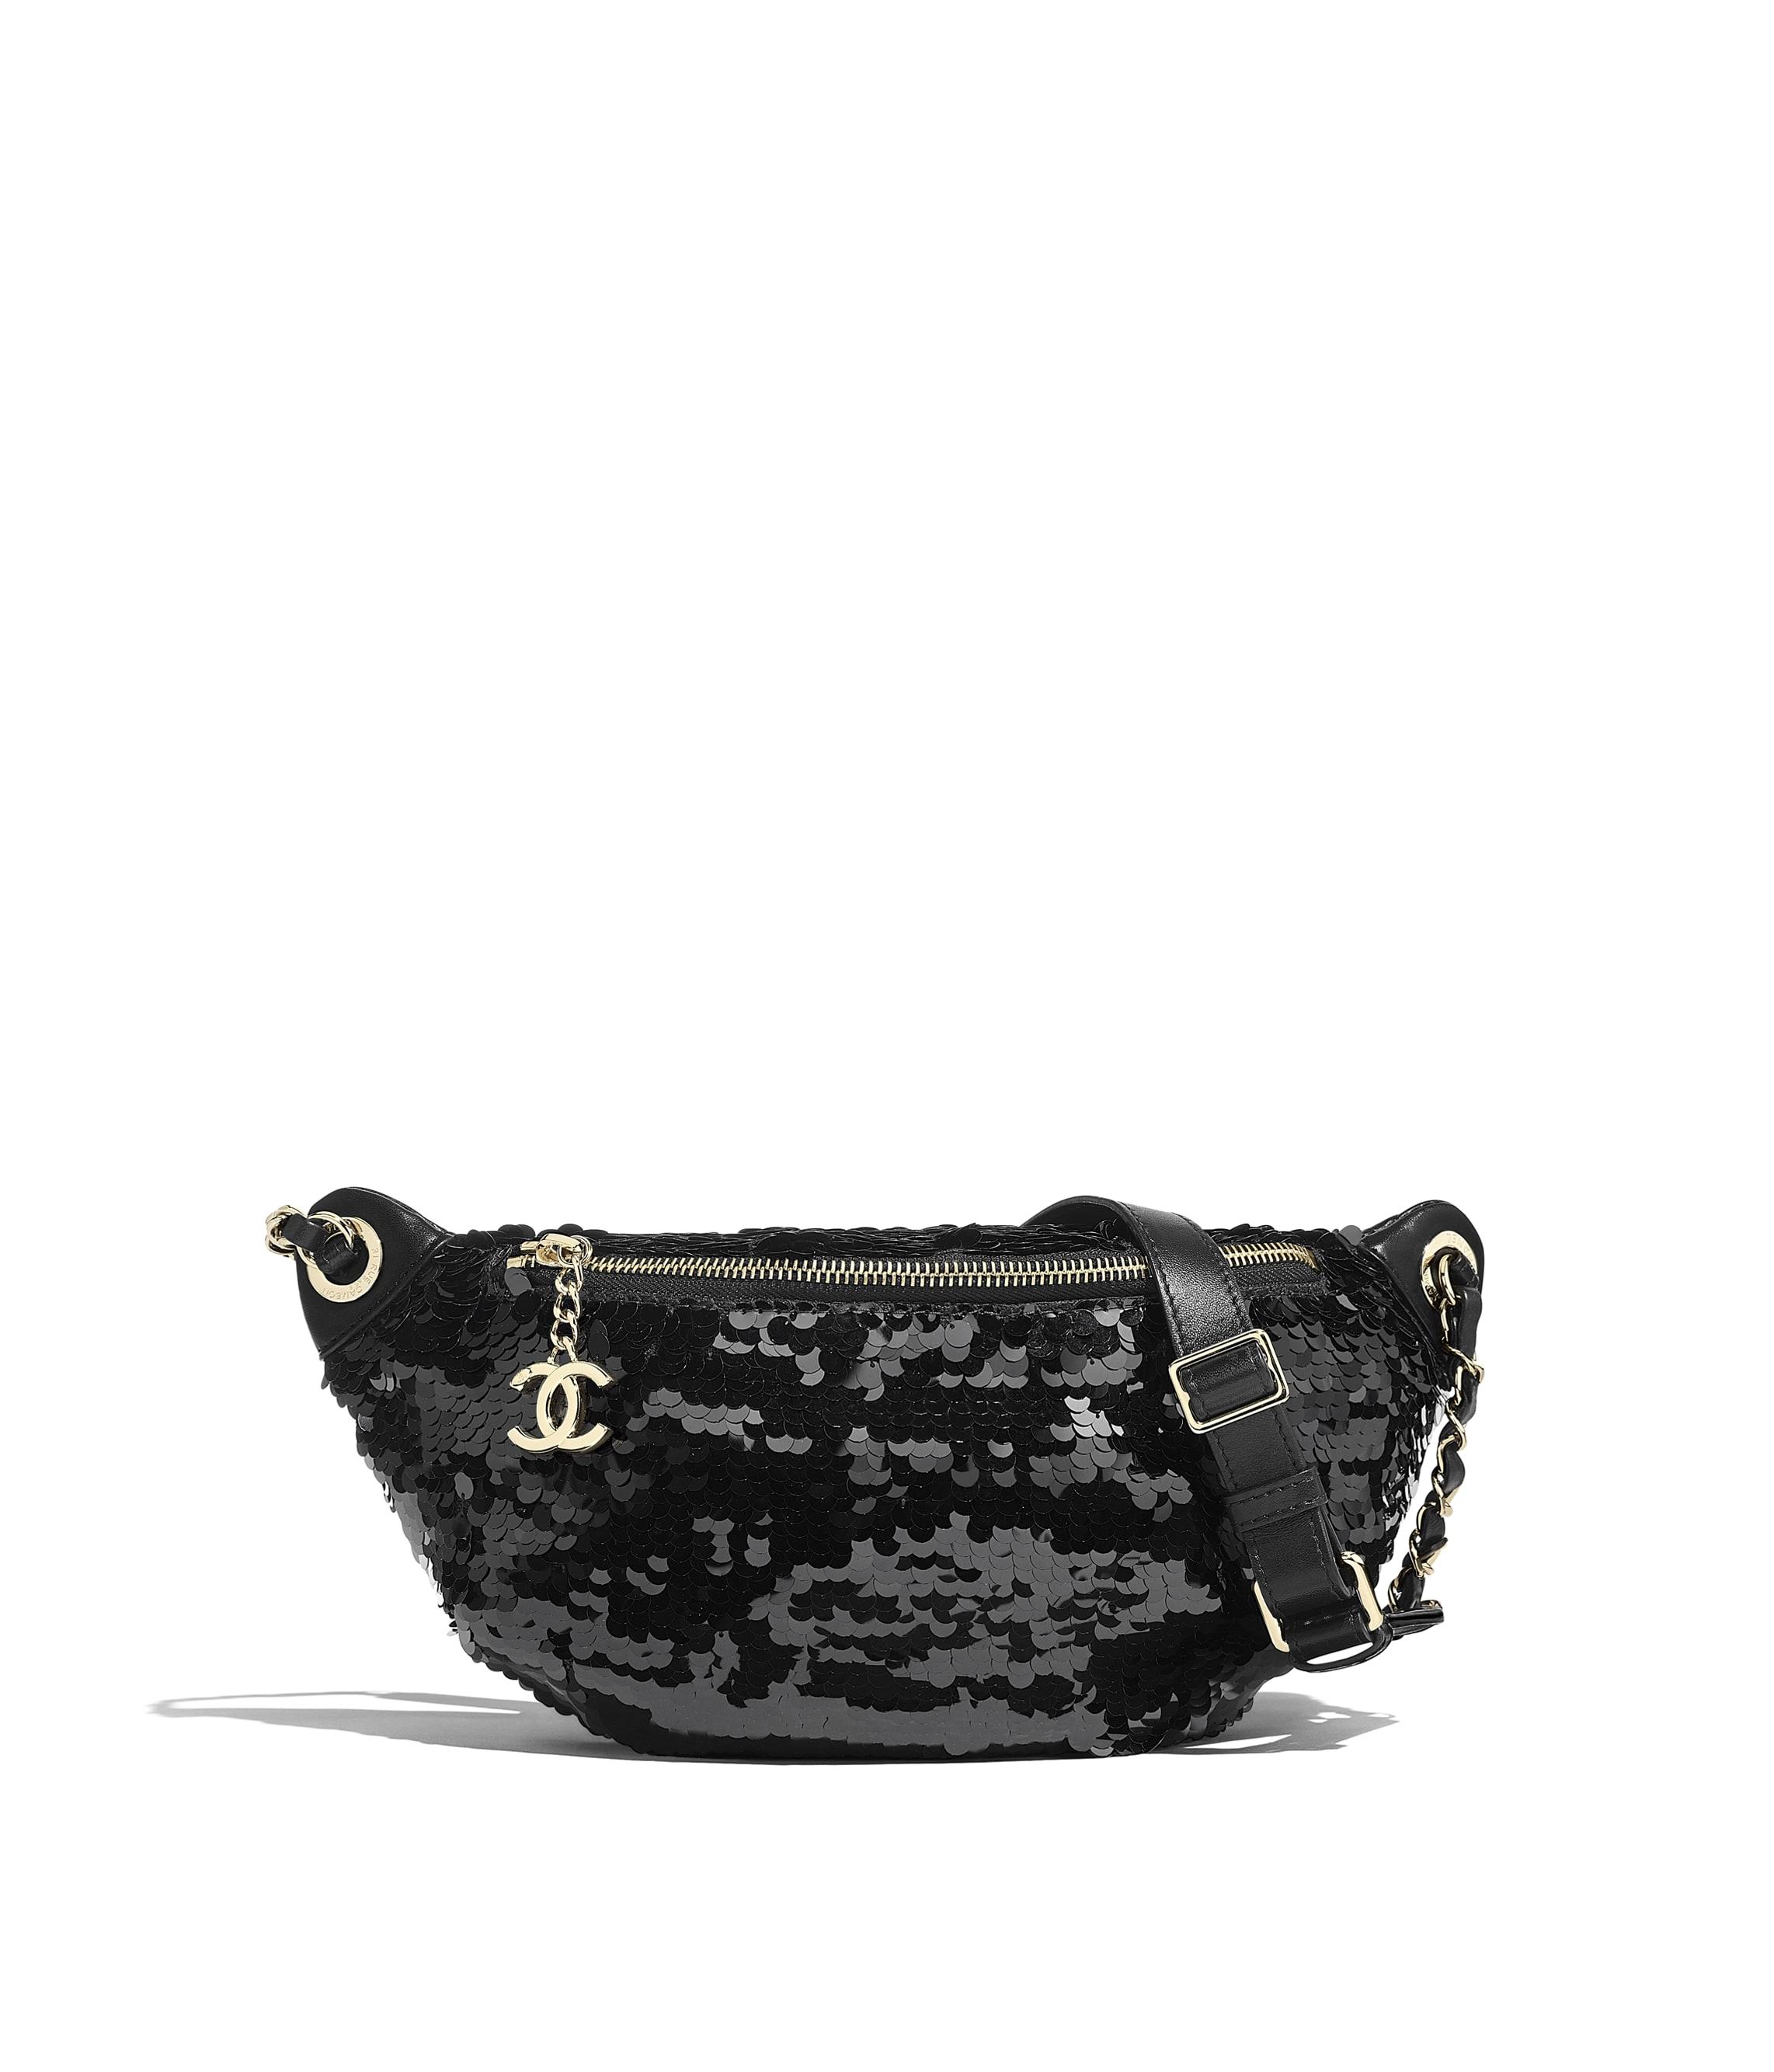 f5ca5c49797 Waist Bag, sequins, lambskin & gold-tone metal, black - CHANEL